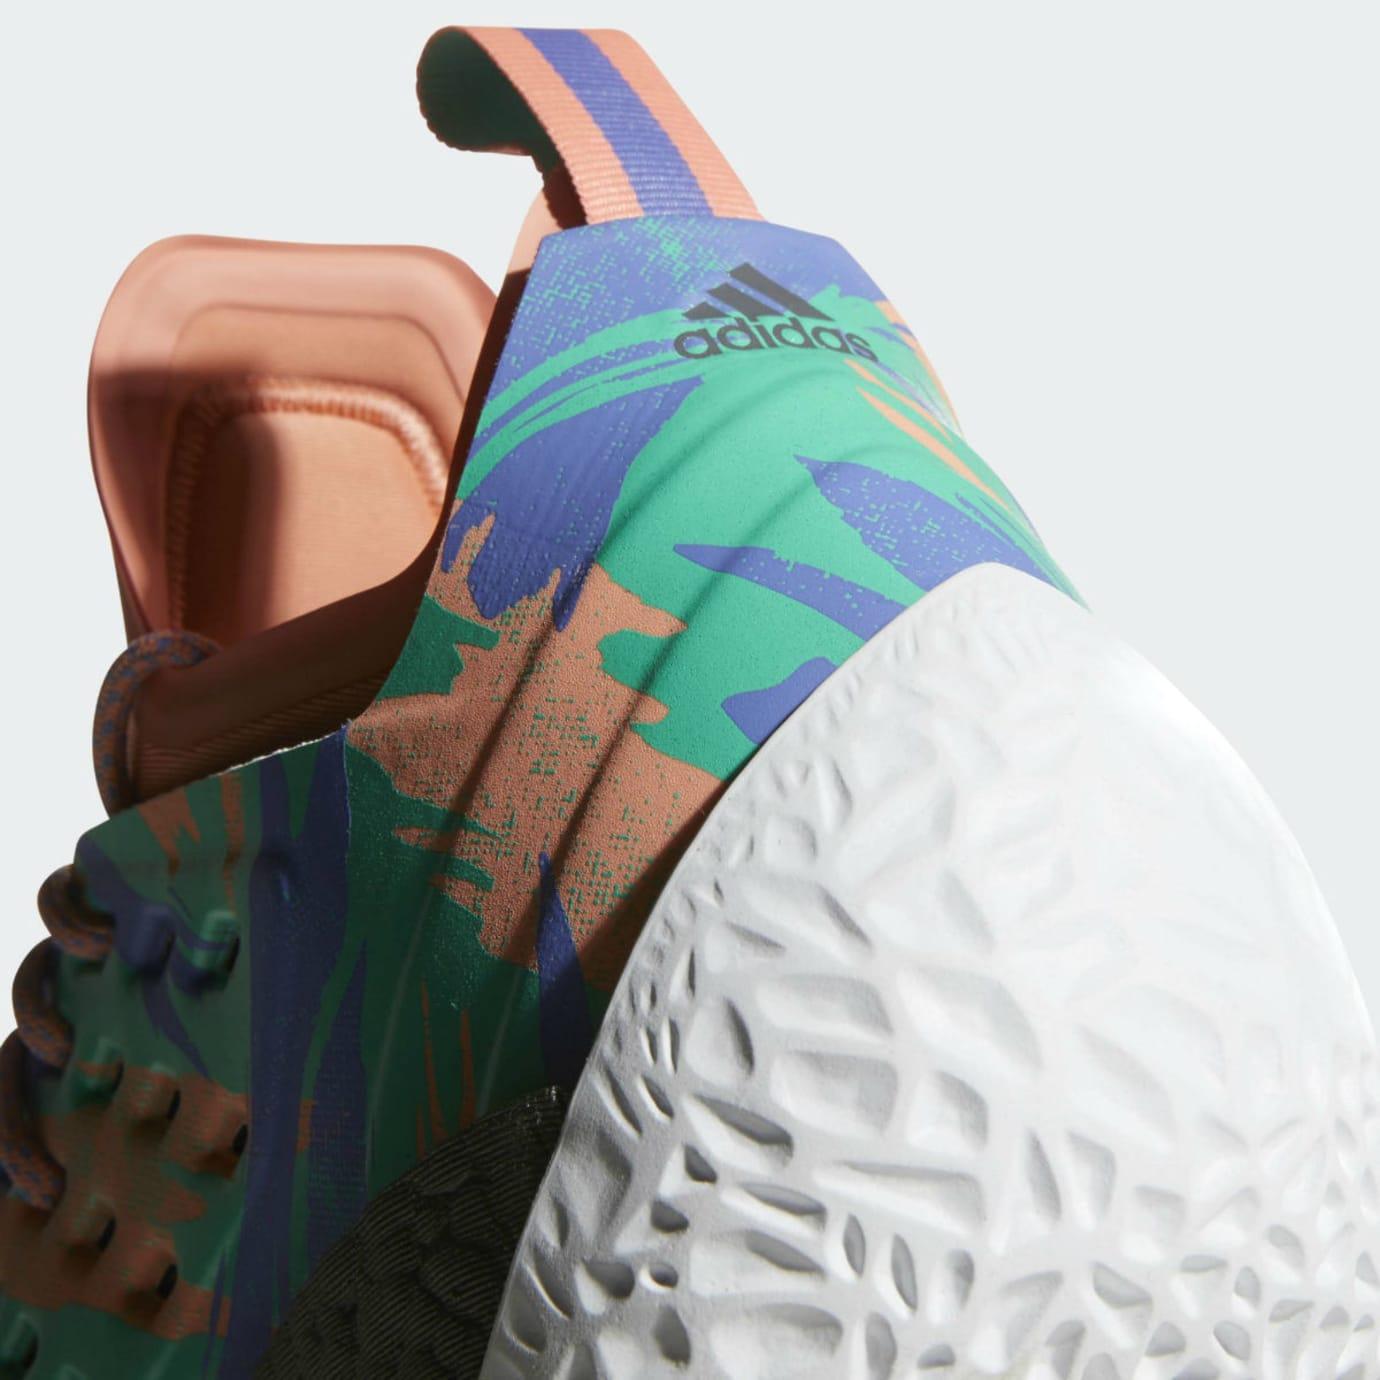 a94d88db2b4 Adidas Harden Vol. 2 Orange Release Date AH2219 Heel